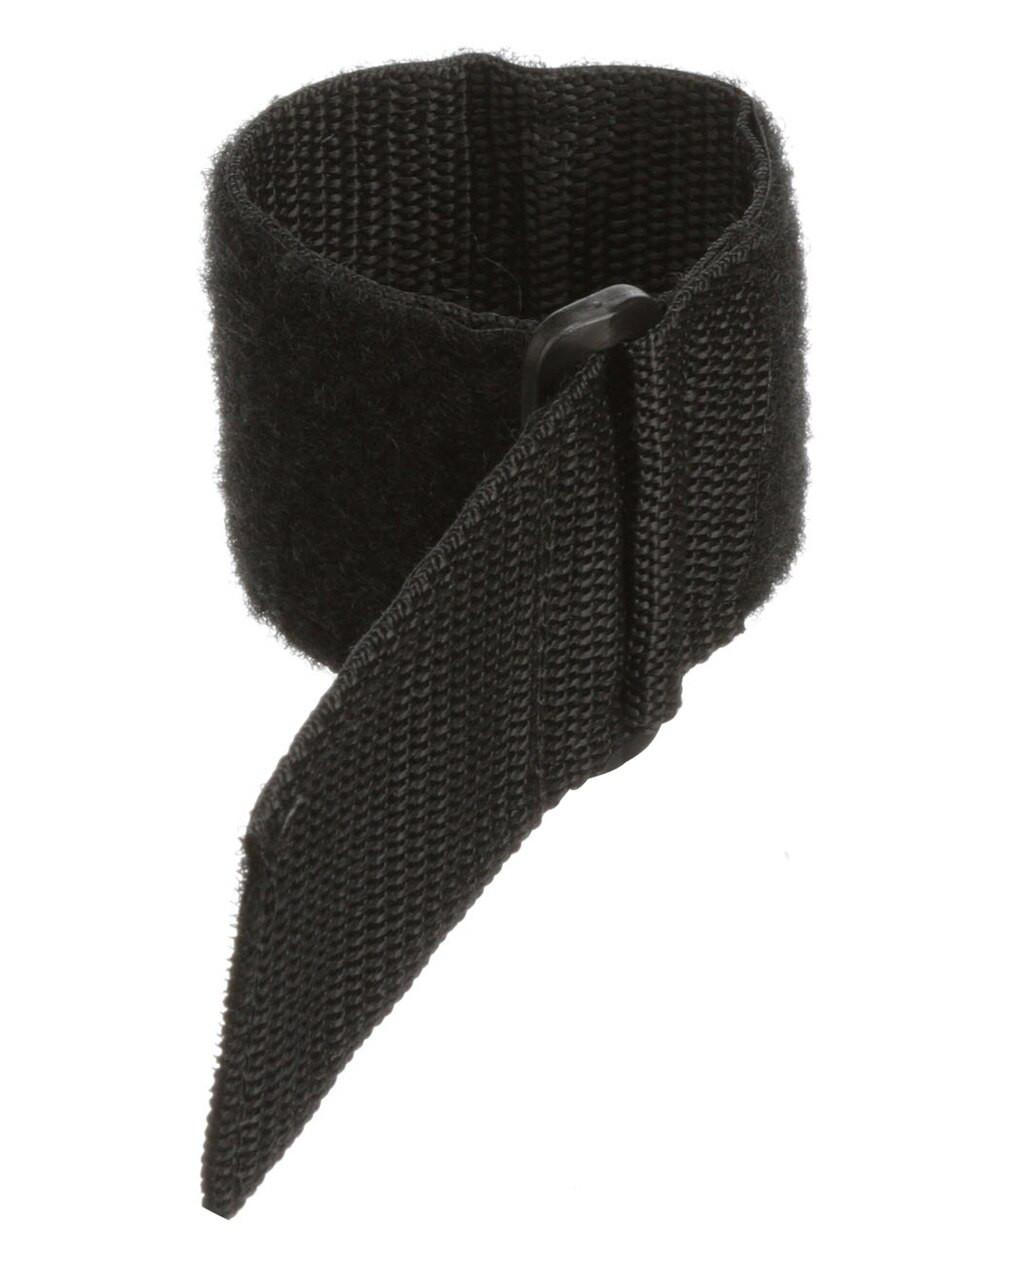 Industrial Cinch Strap / Velcro Straps - Bundling Straps - Velcro Tie - Velcro Strap